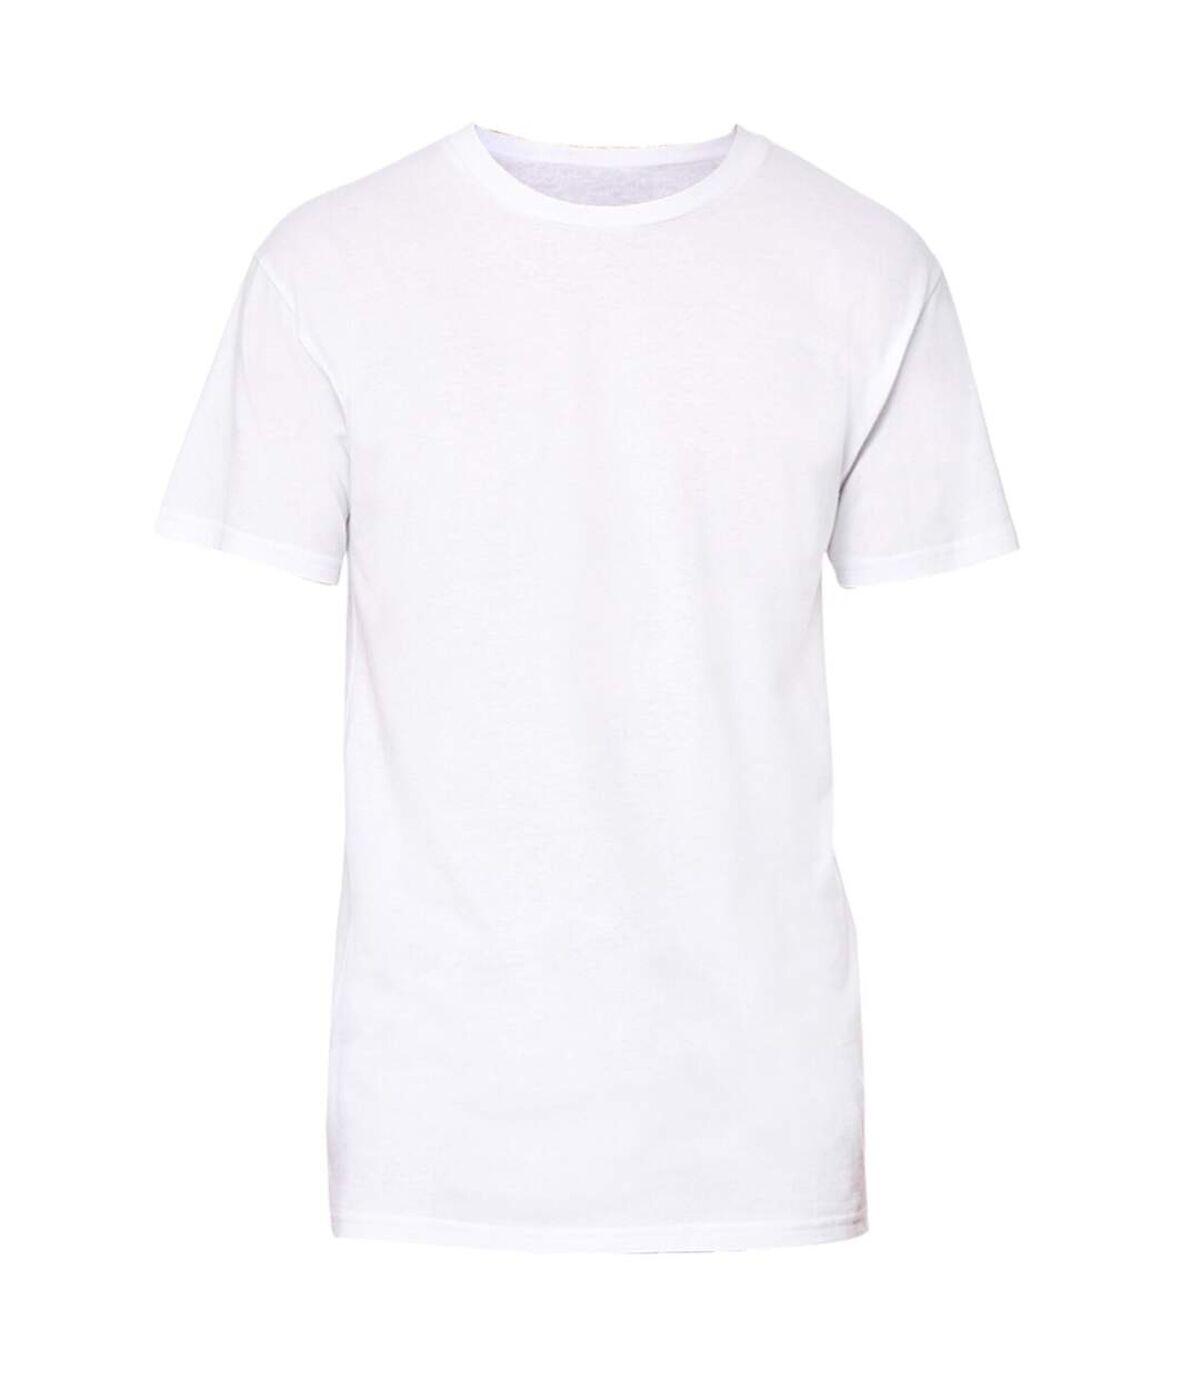 Bella + Canvas Mens Long Body Urban T-Shirt (White) - UTRW4914